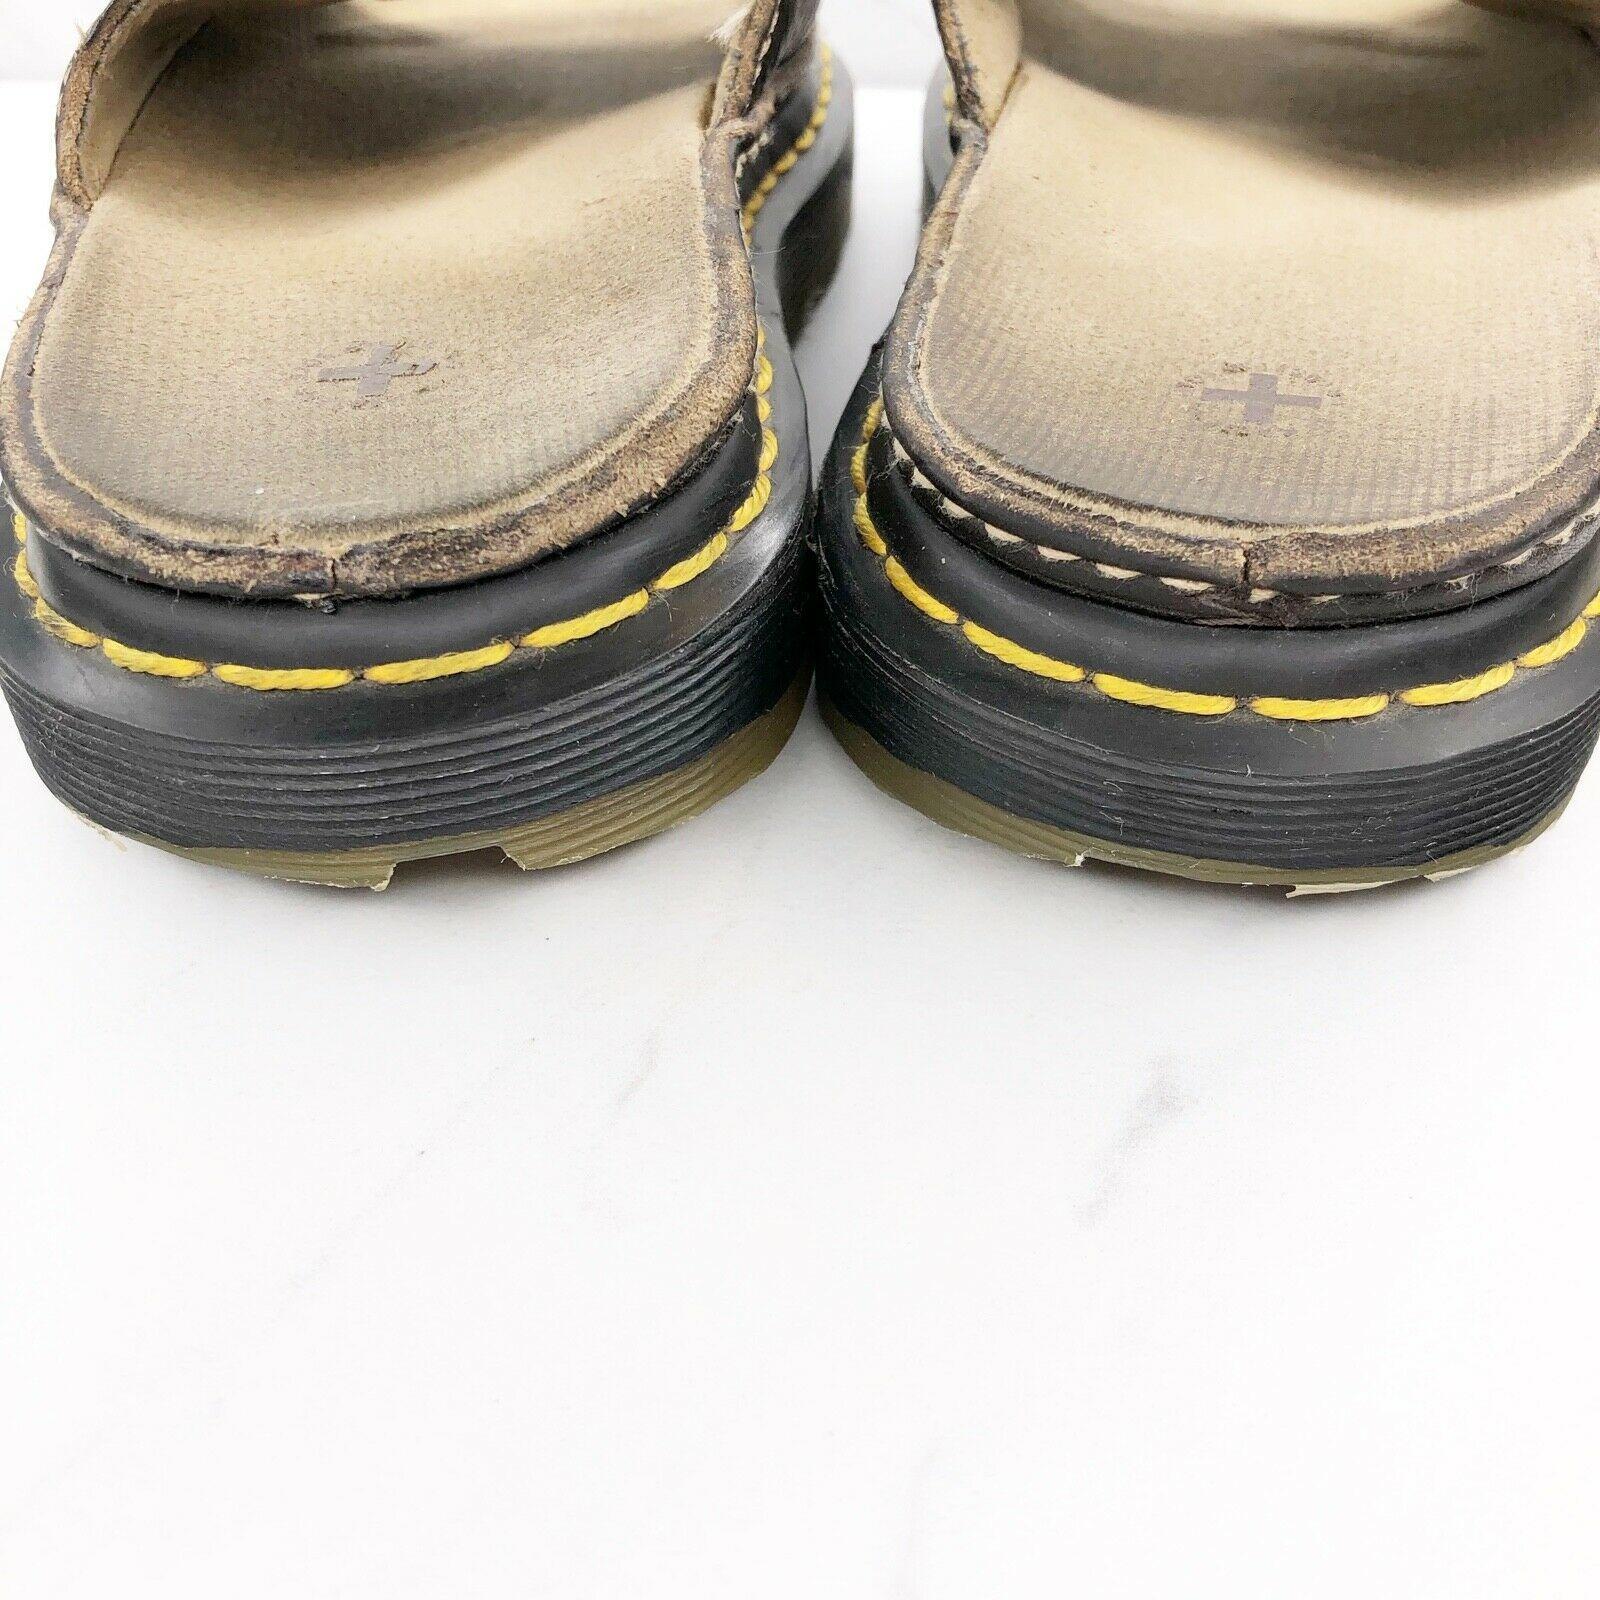 Dr. Martens Women's 6 M Brown Leather Sandals Slides Shoes image 5